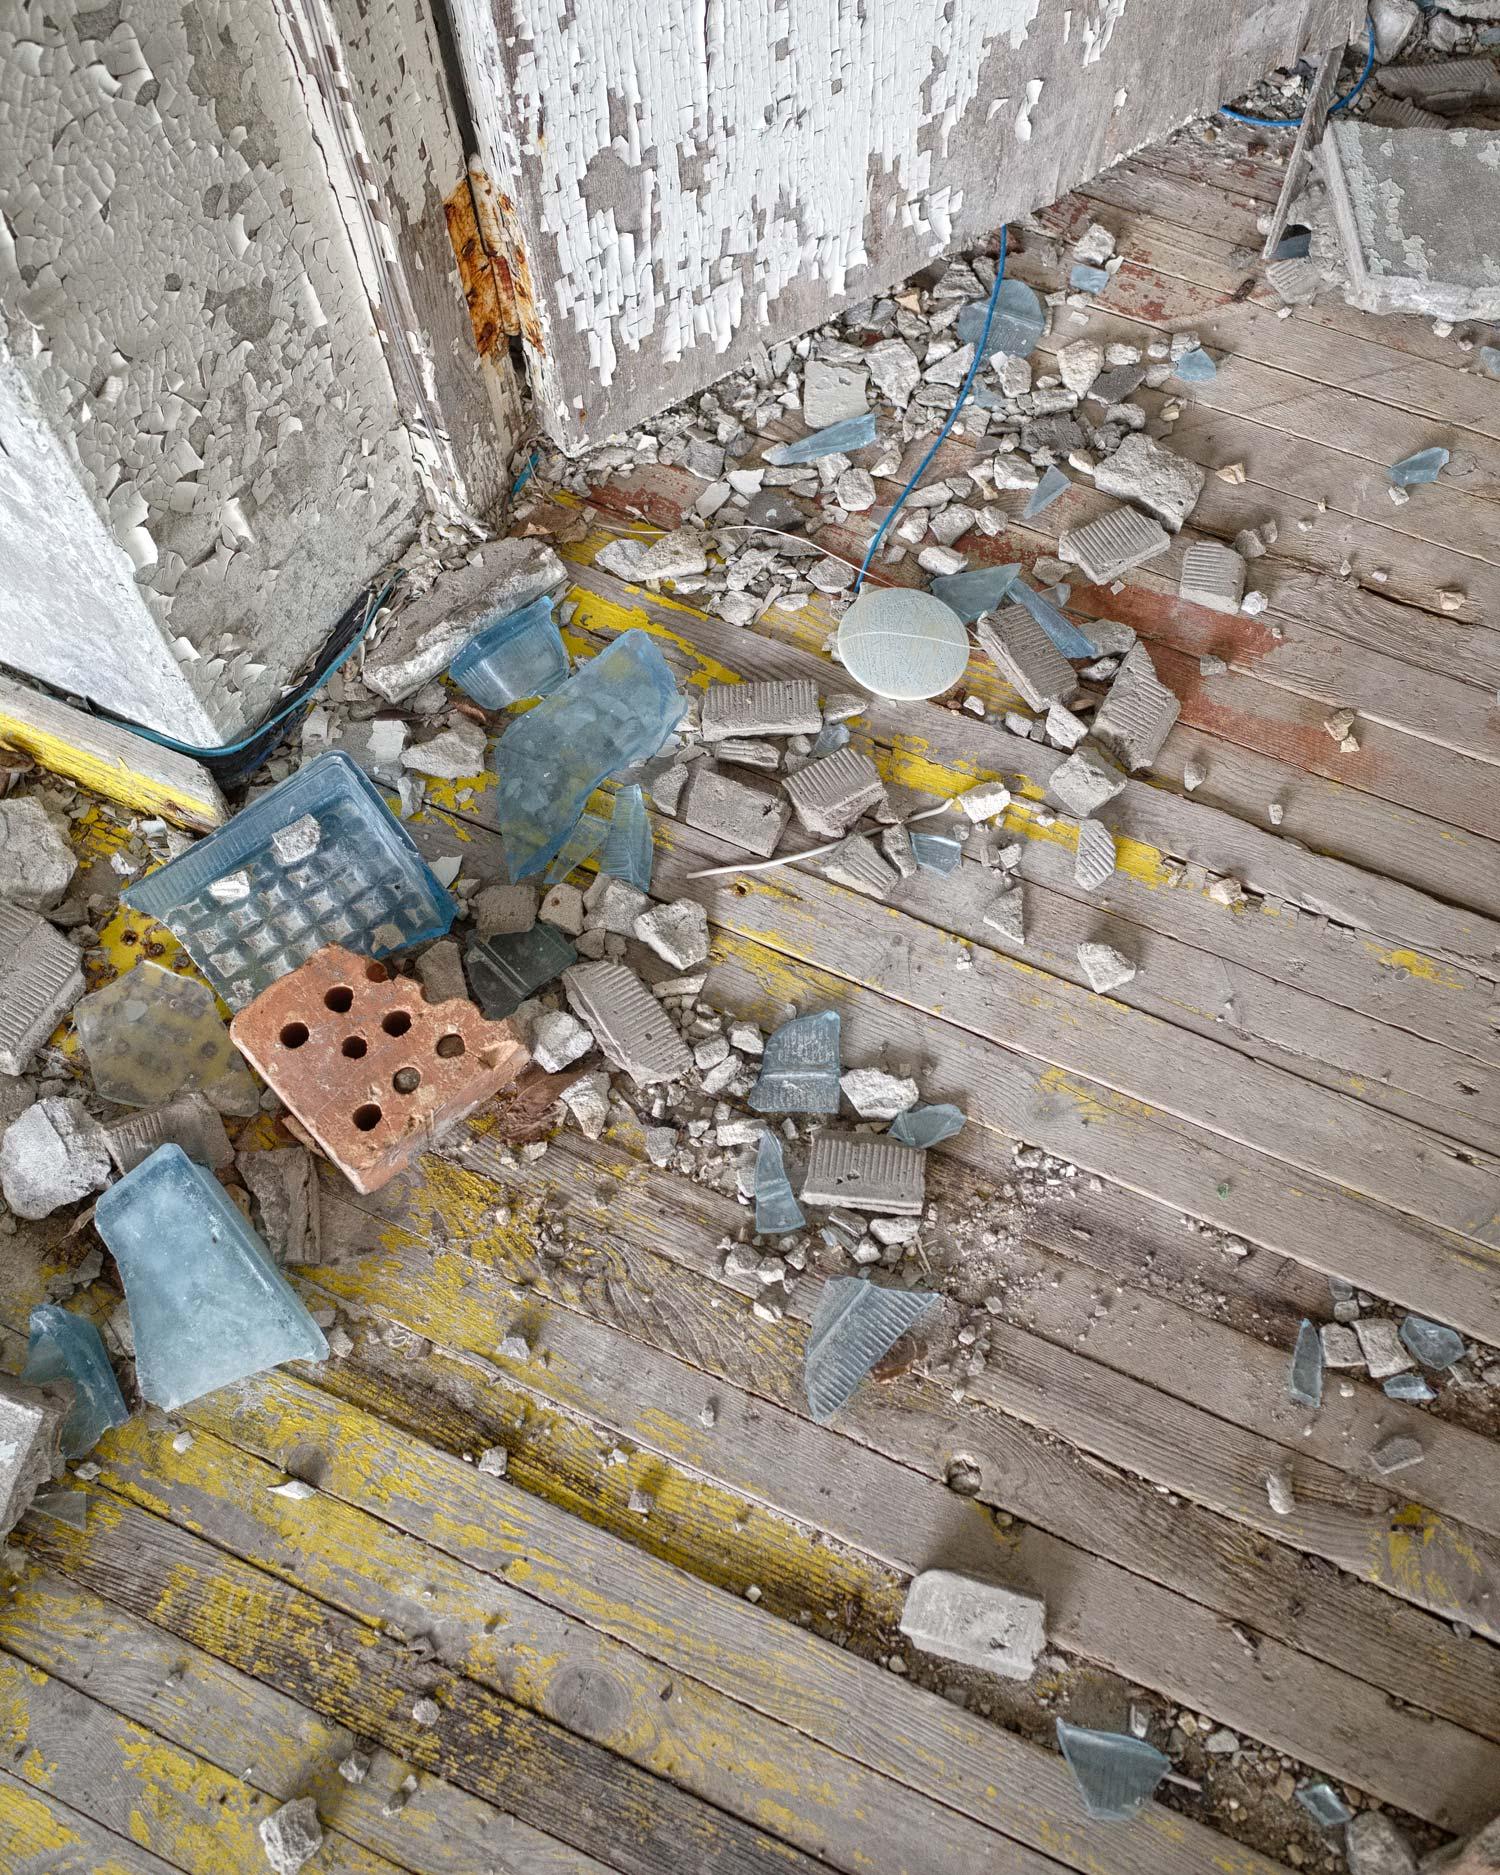 098_chernobyl_PalaceOfCulture.jpg